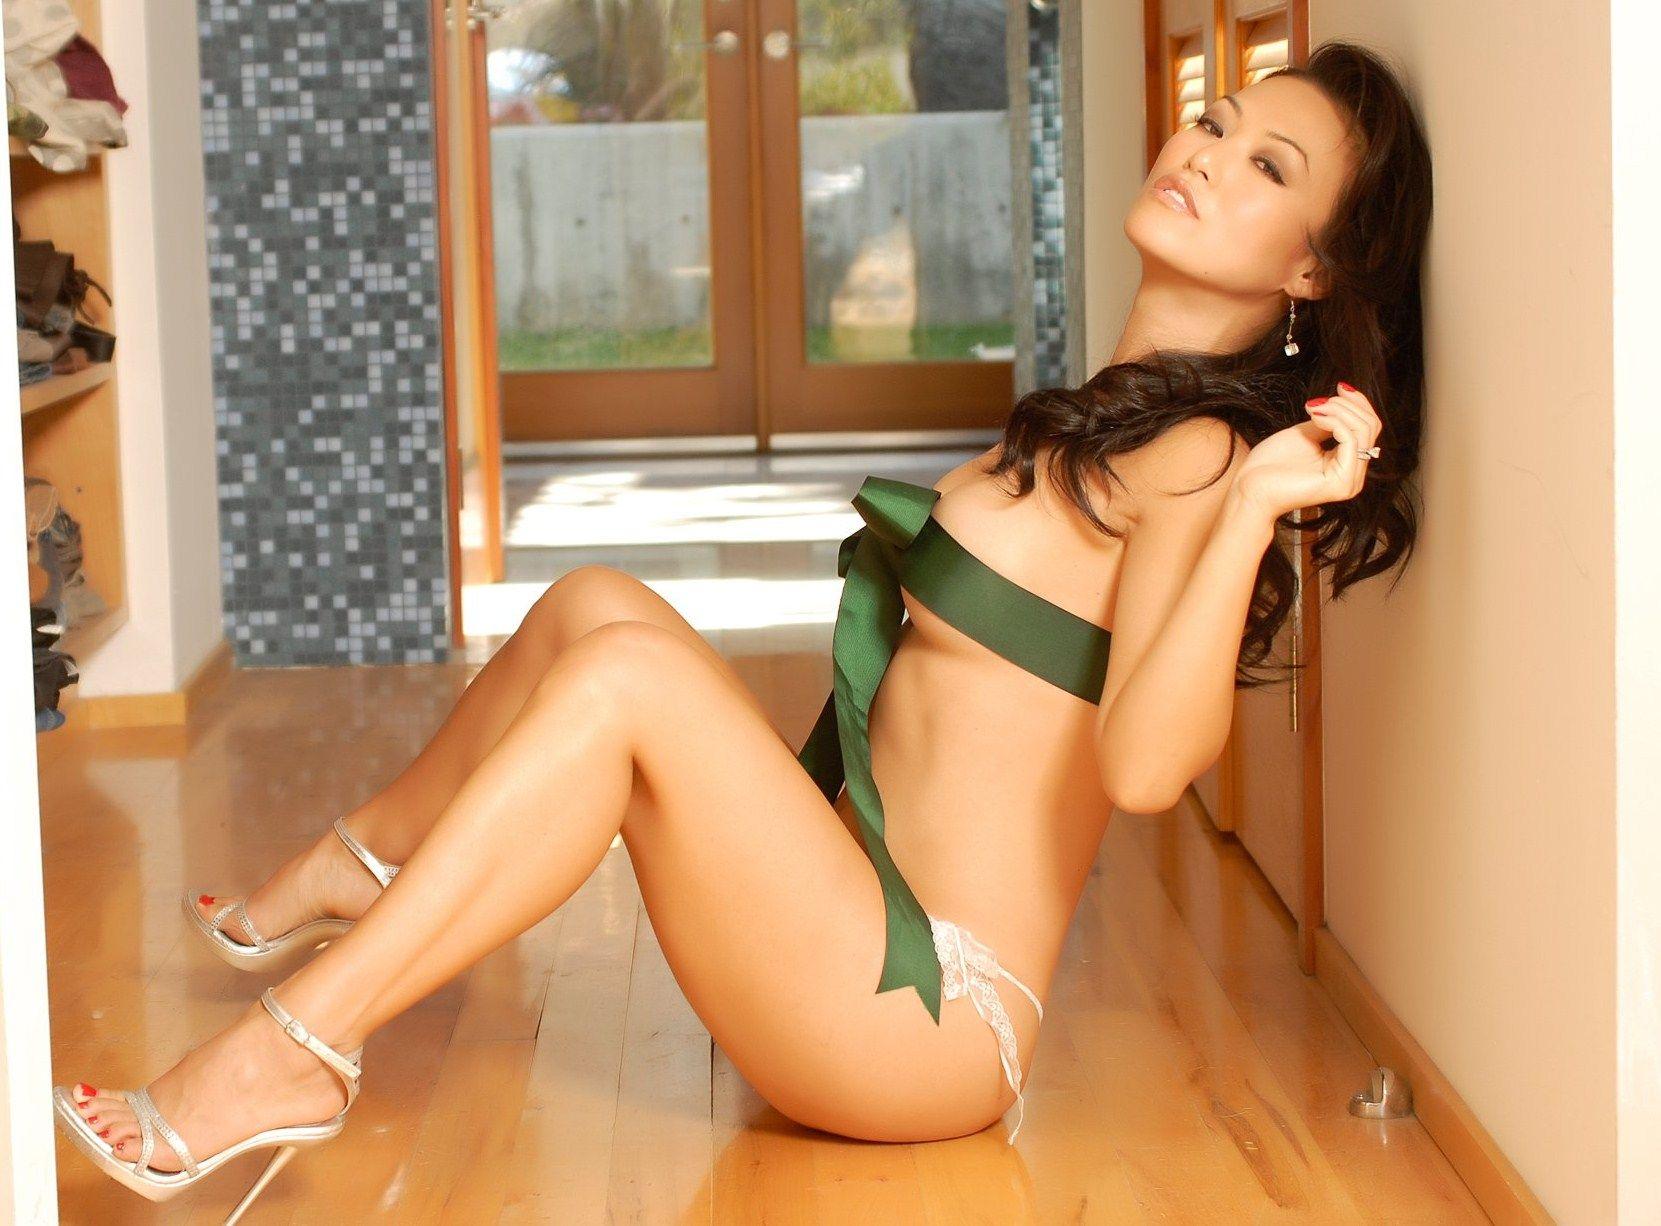 SEX AGENCY Yishan